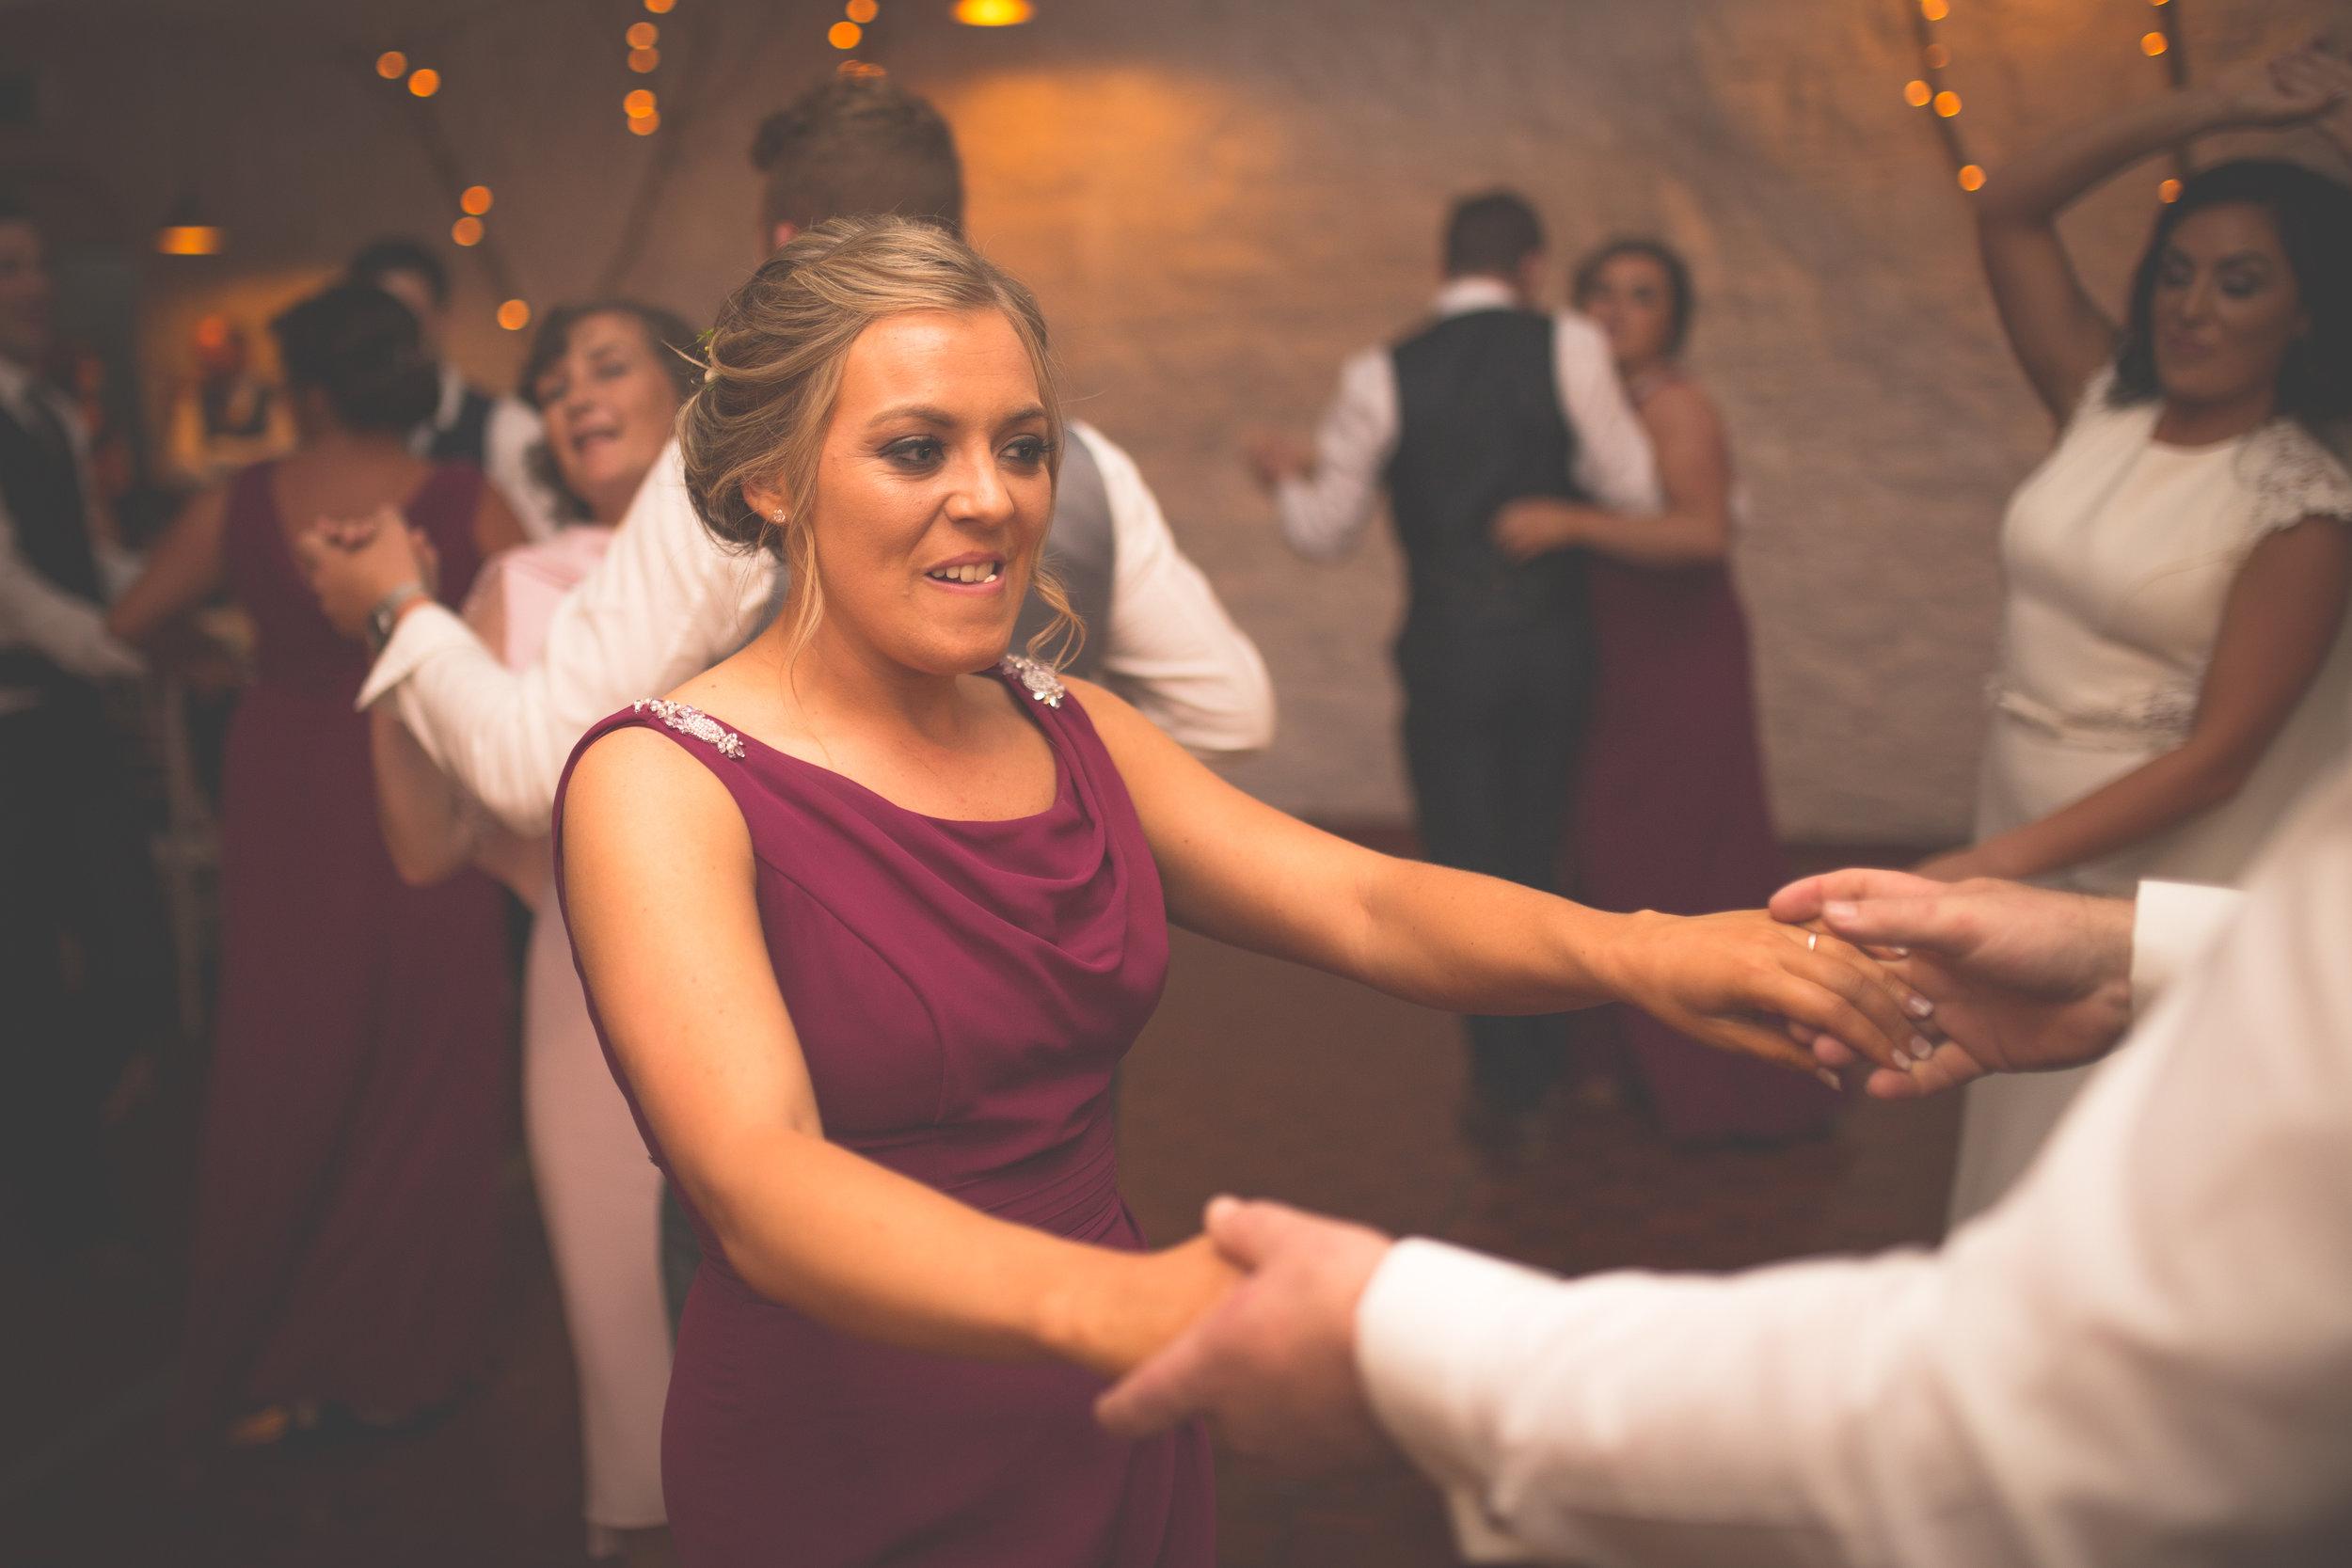 Brian McEwan Wedding Photography | Carol-Annee & Sean | The Dancing-36.jpg